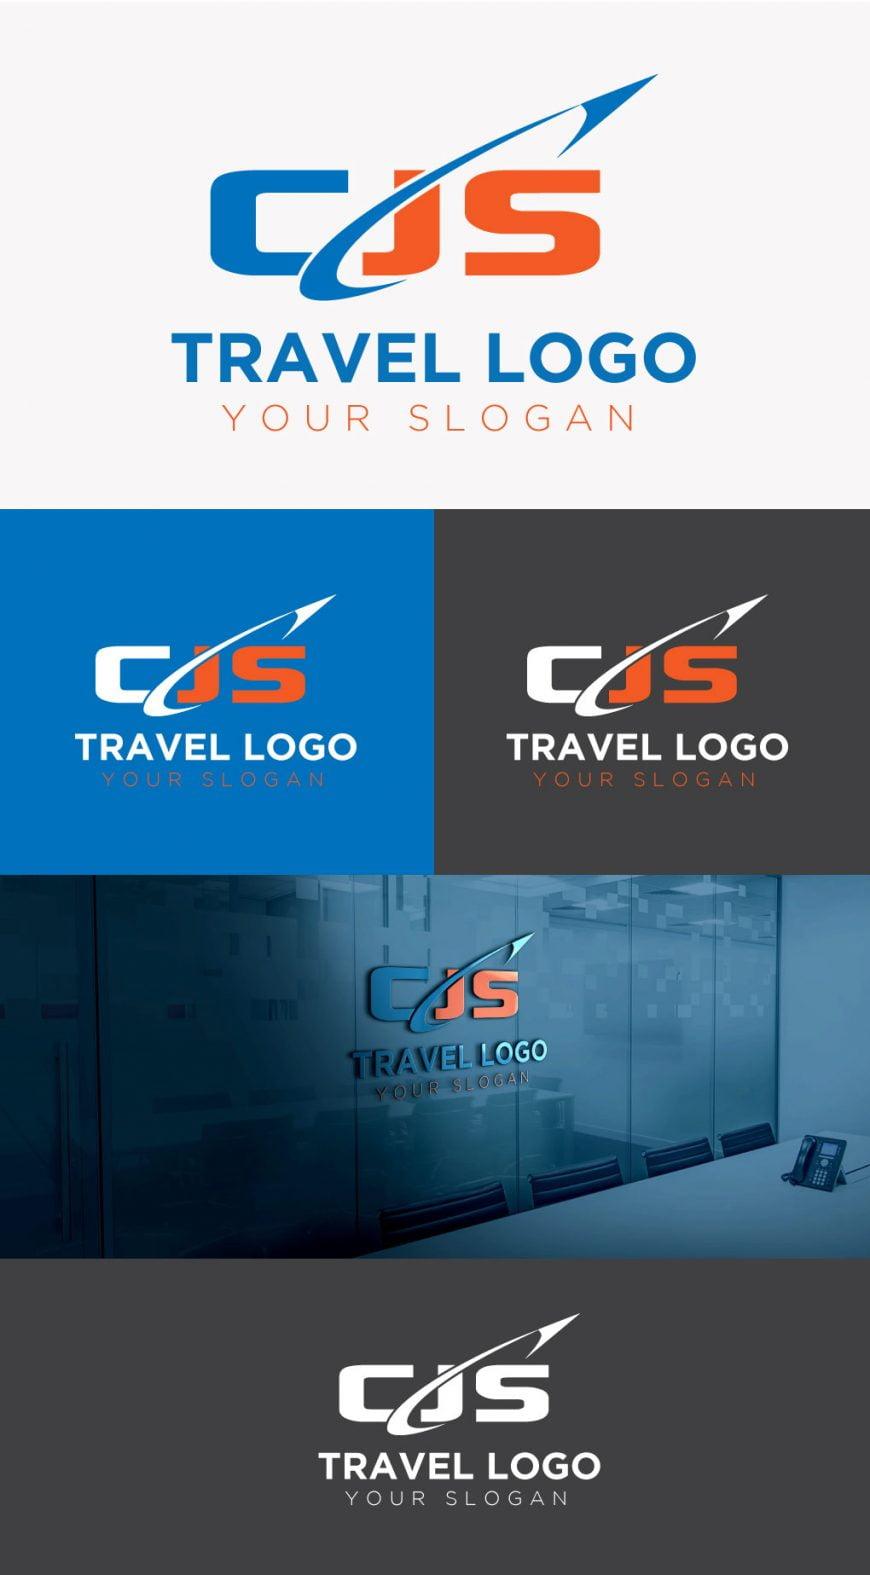 Modern-travel-logo-template